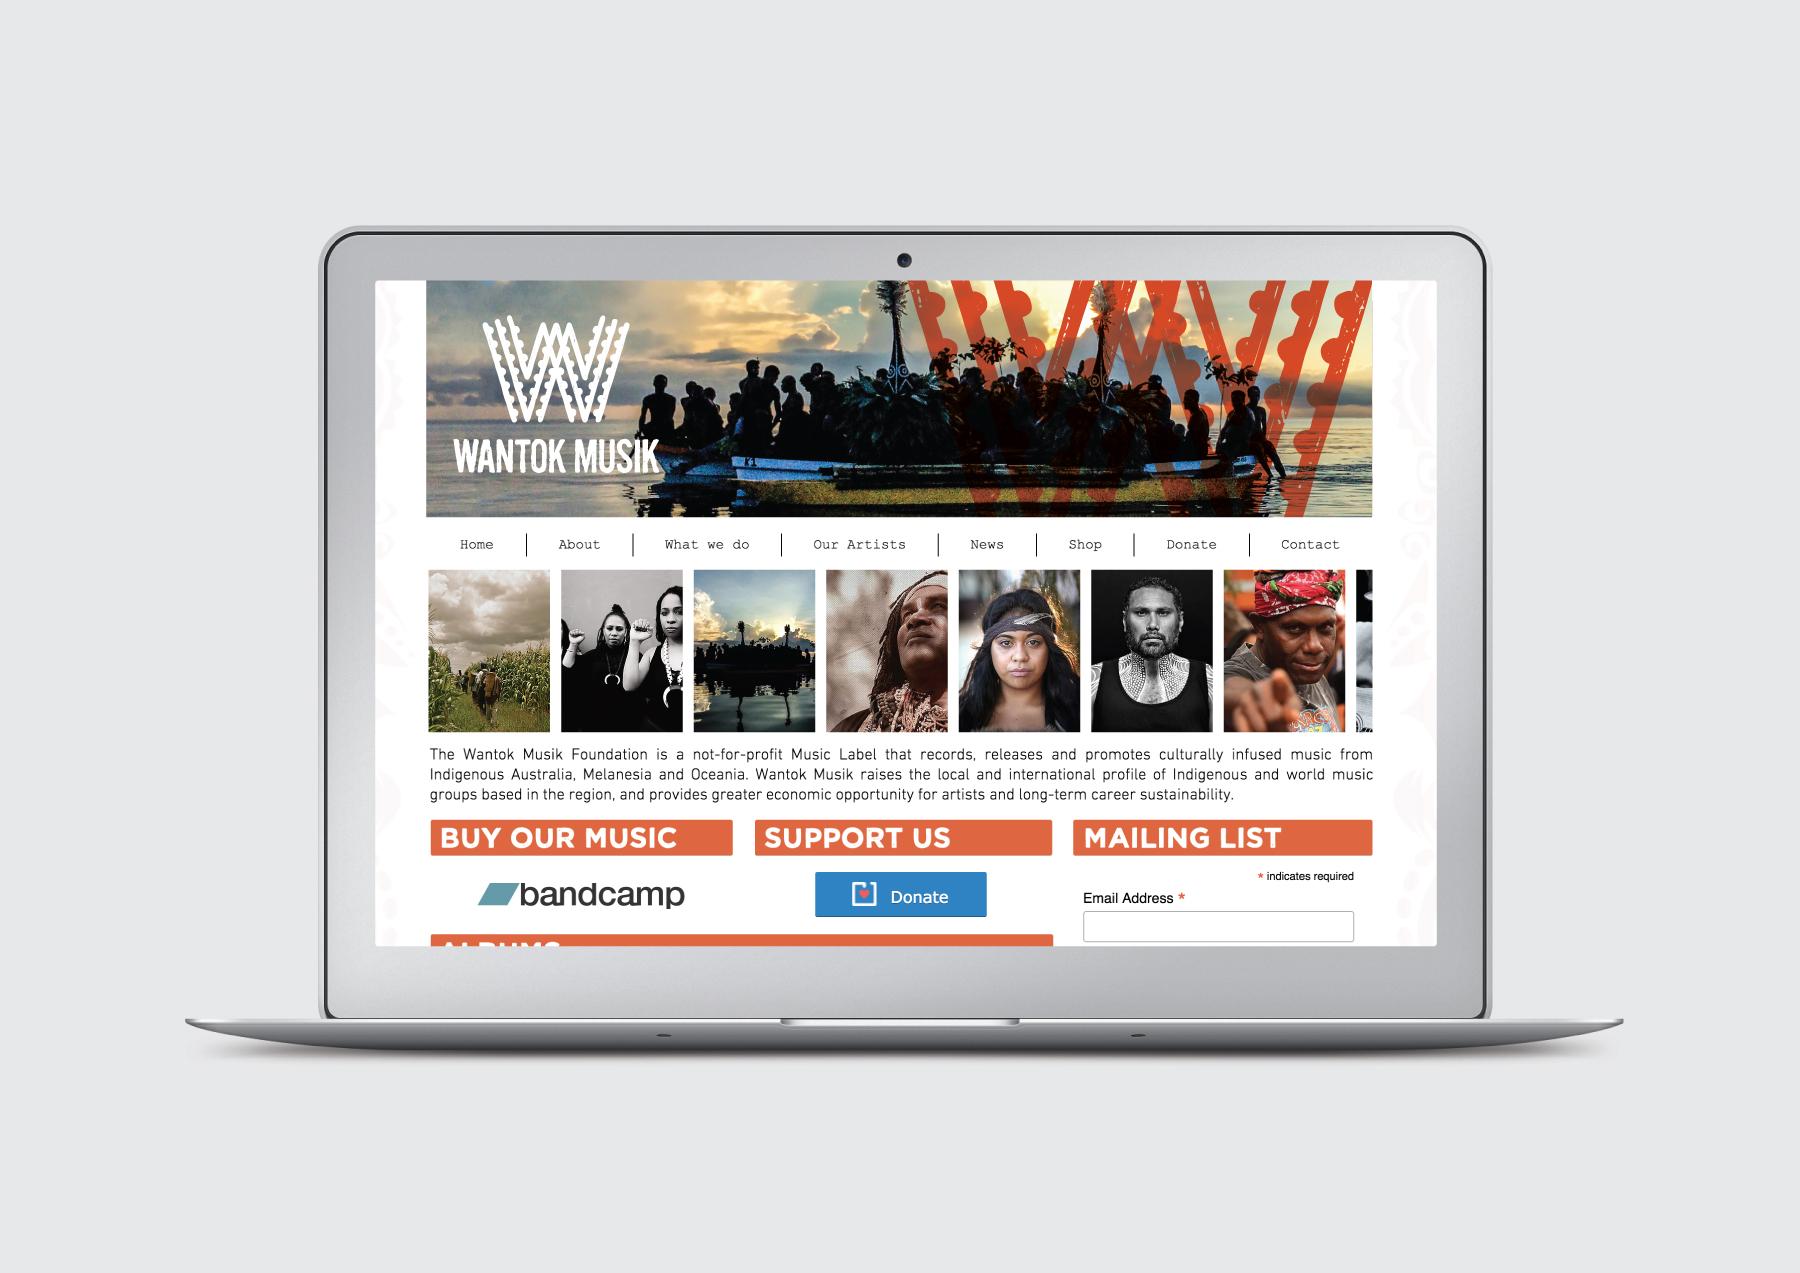 Wantok Musik Website banner